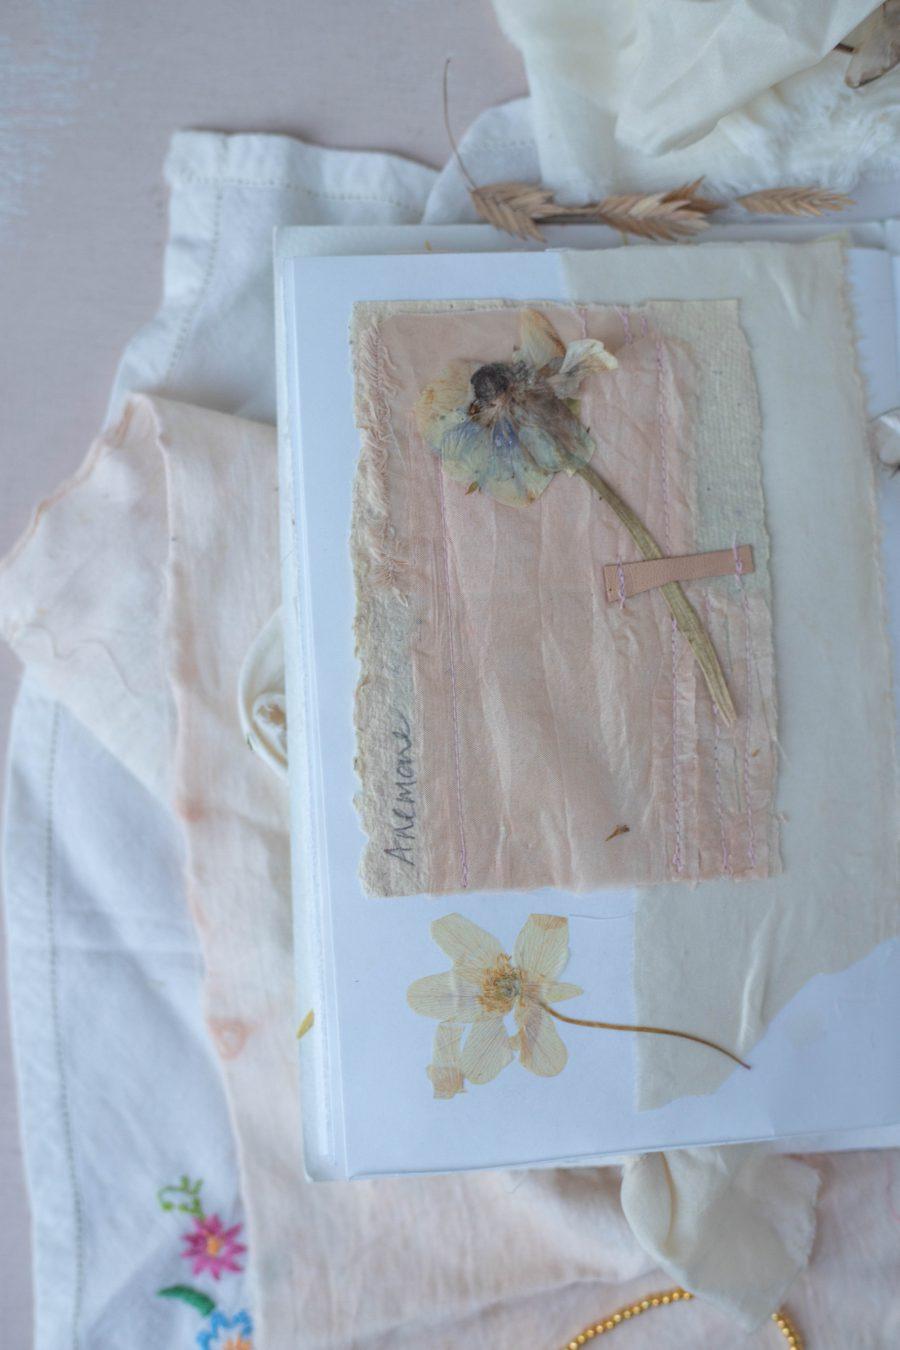 Pressed anemones